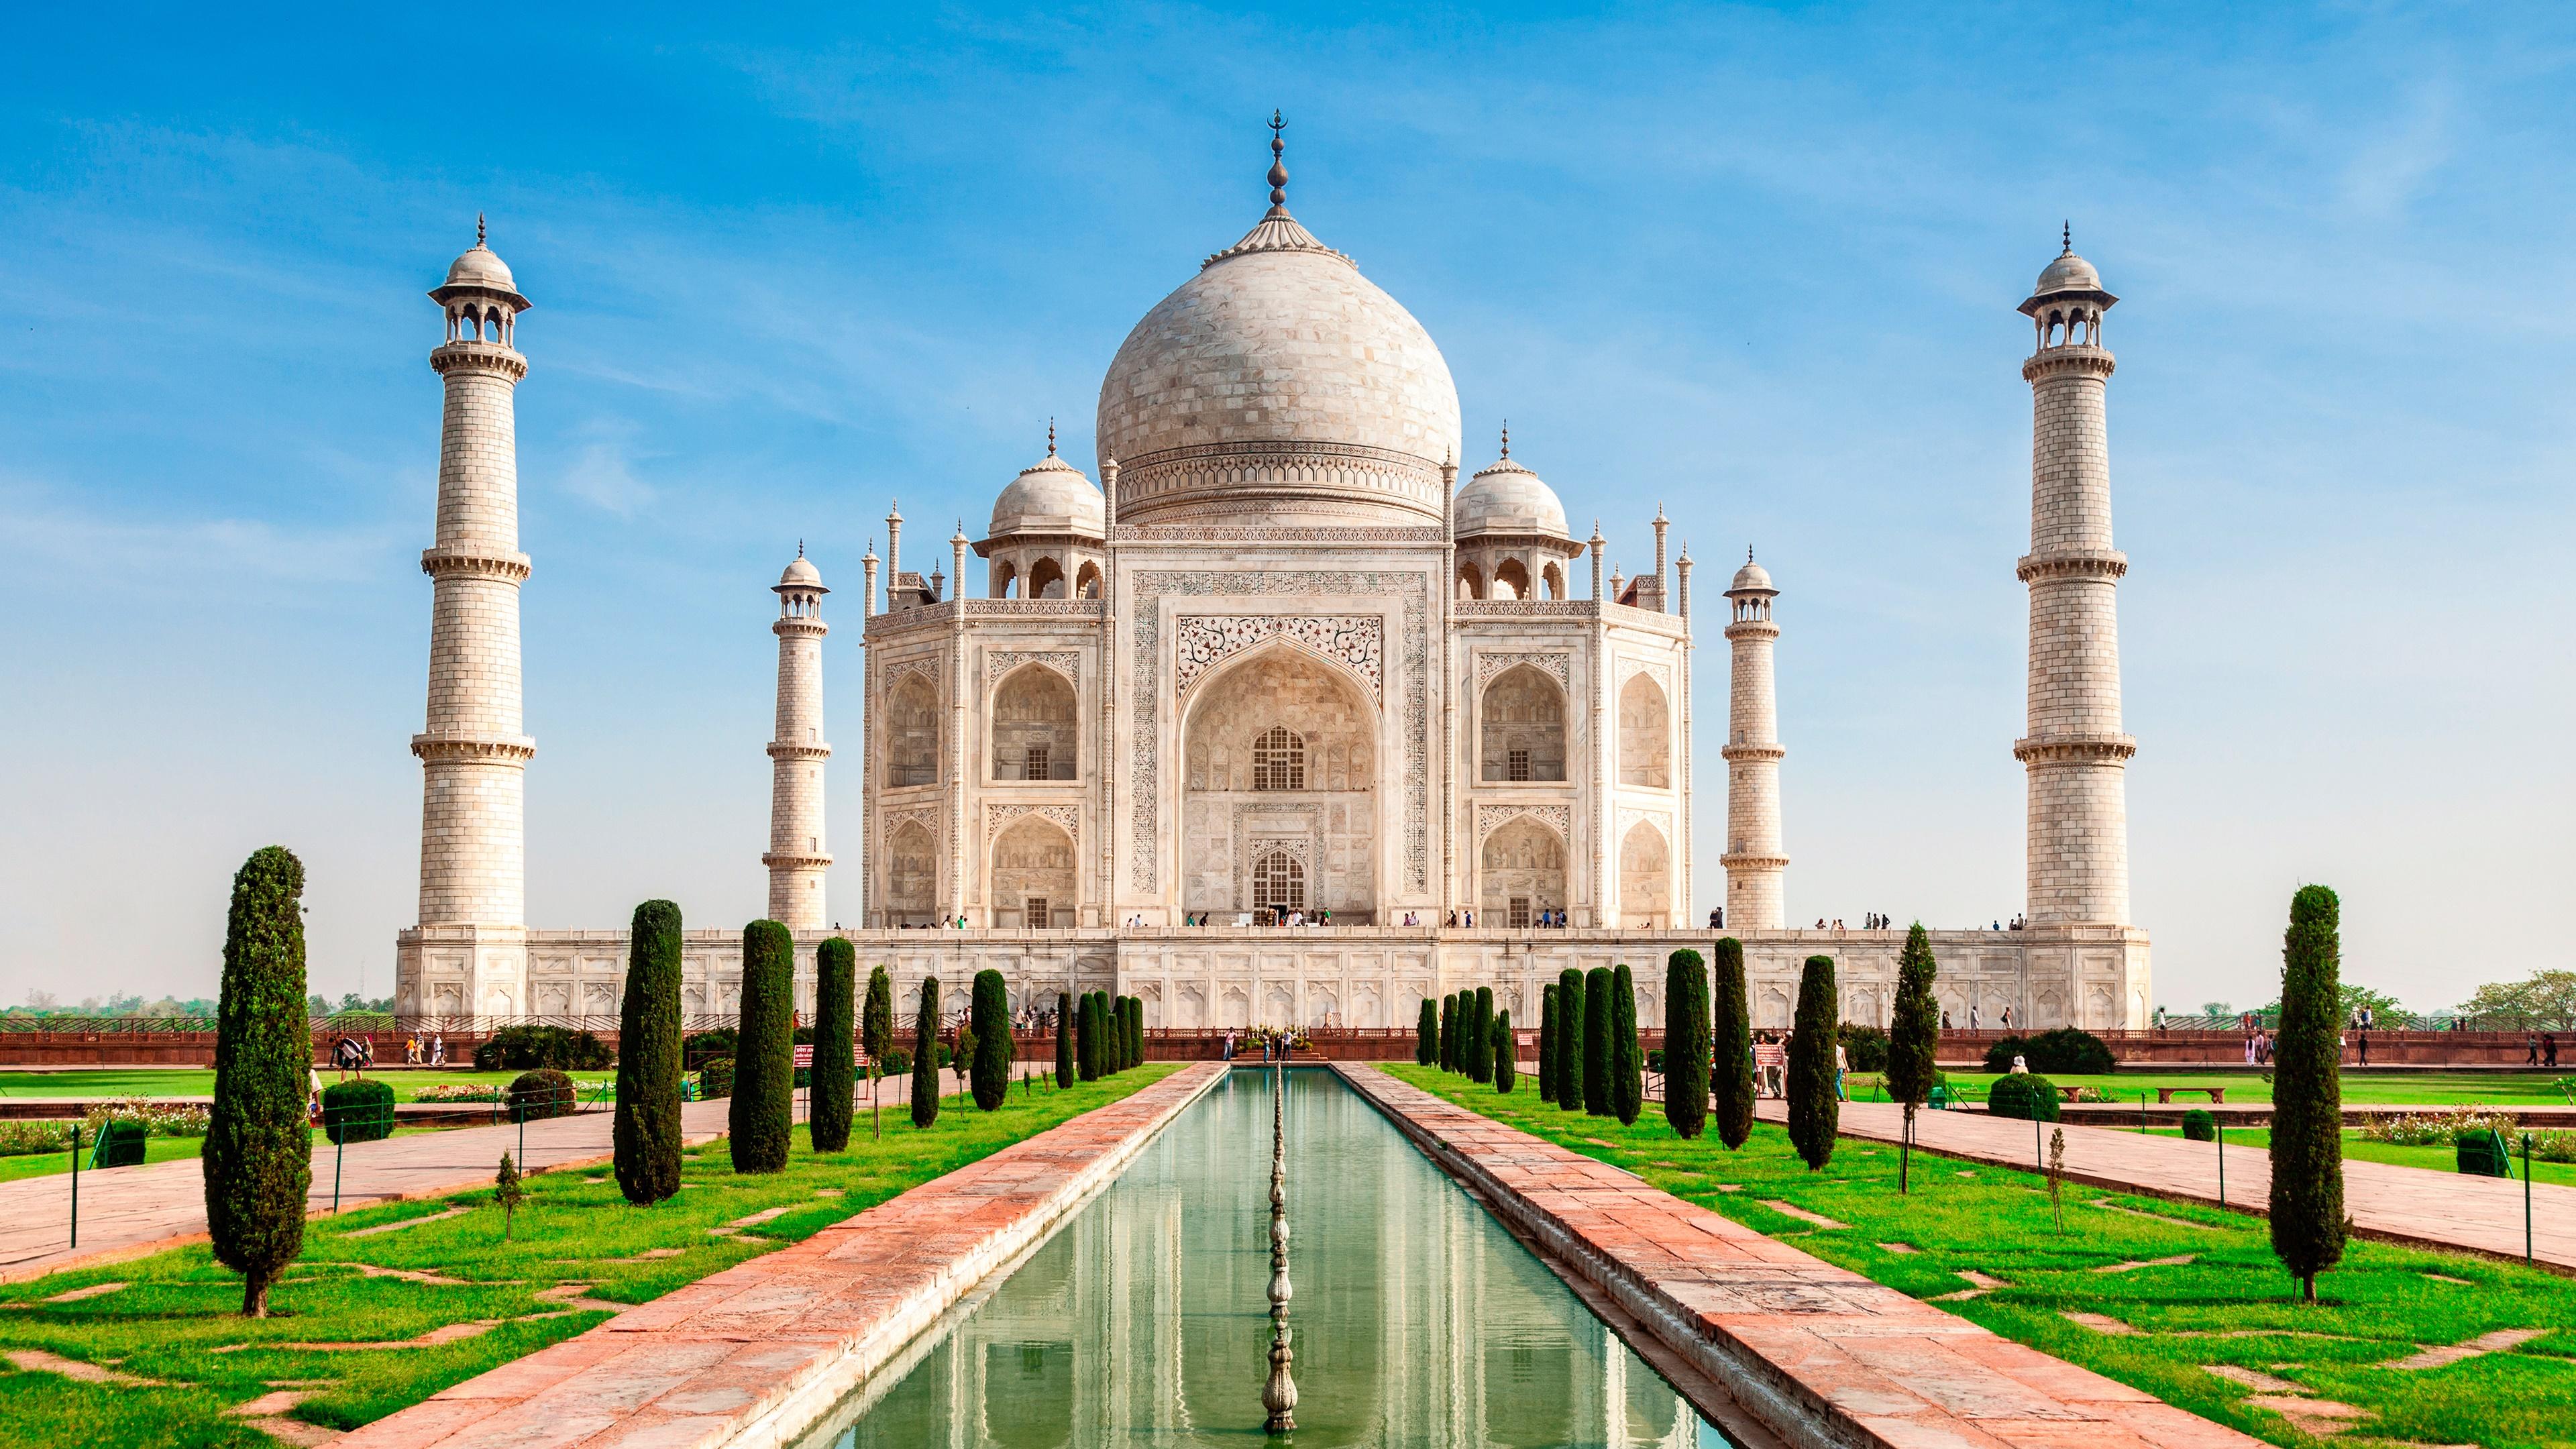 Taj Mahal - 7 wonders of world wallpaper